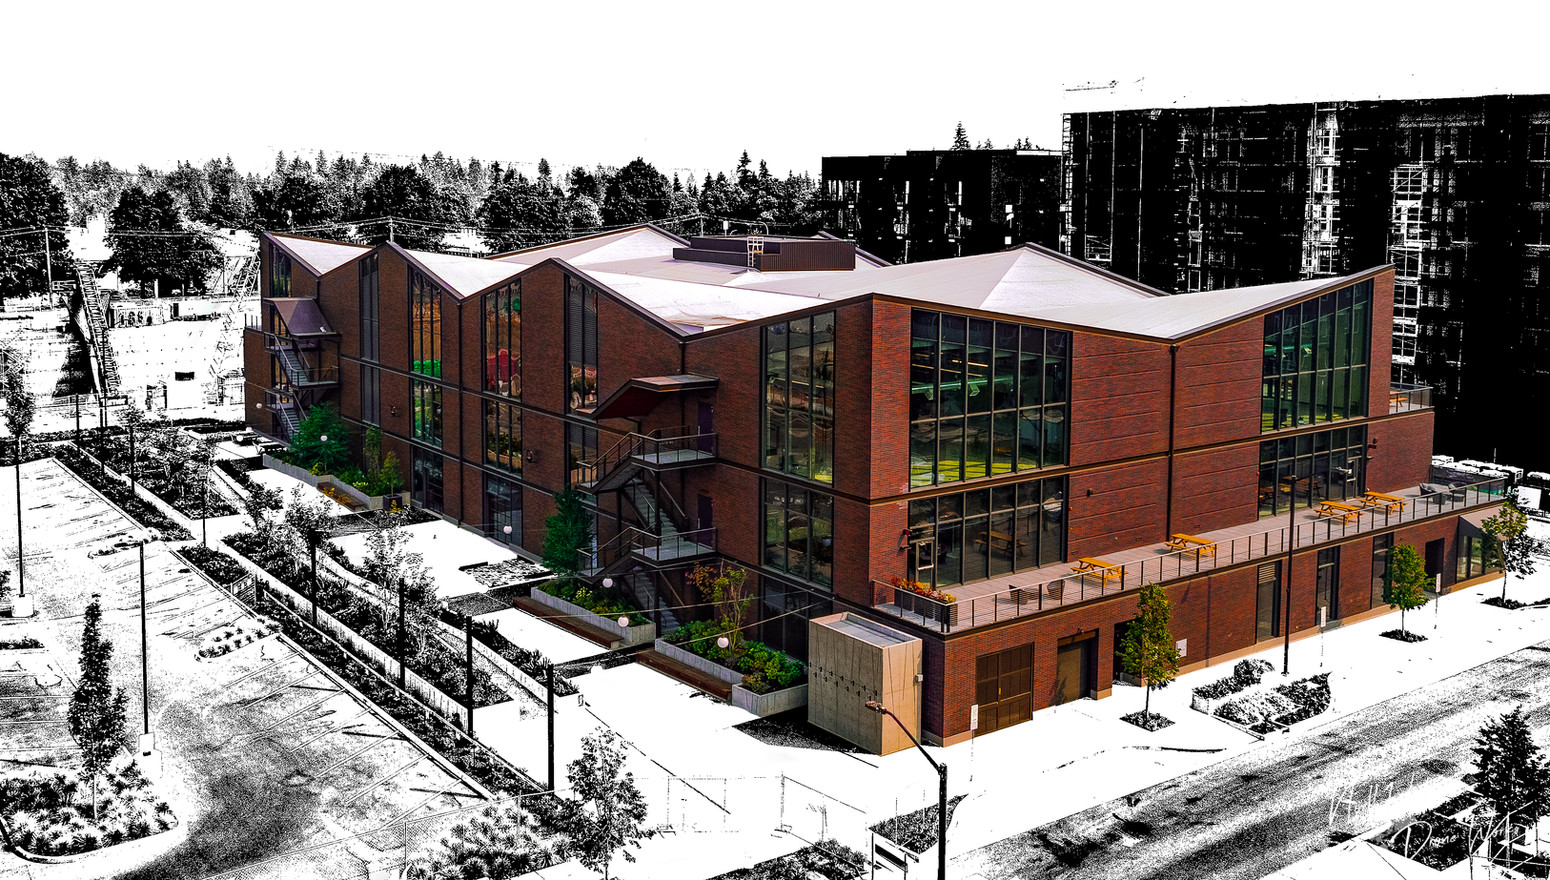 Global Innovation Exchange. Bellevue, WA